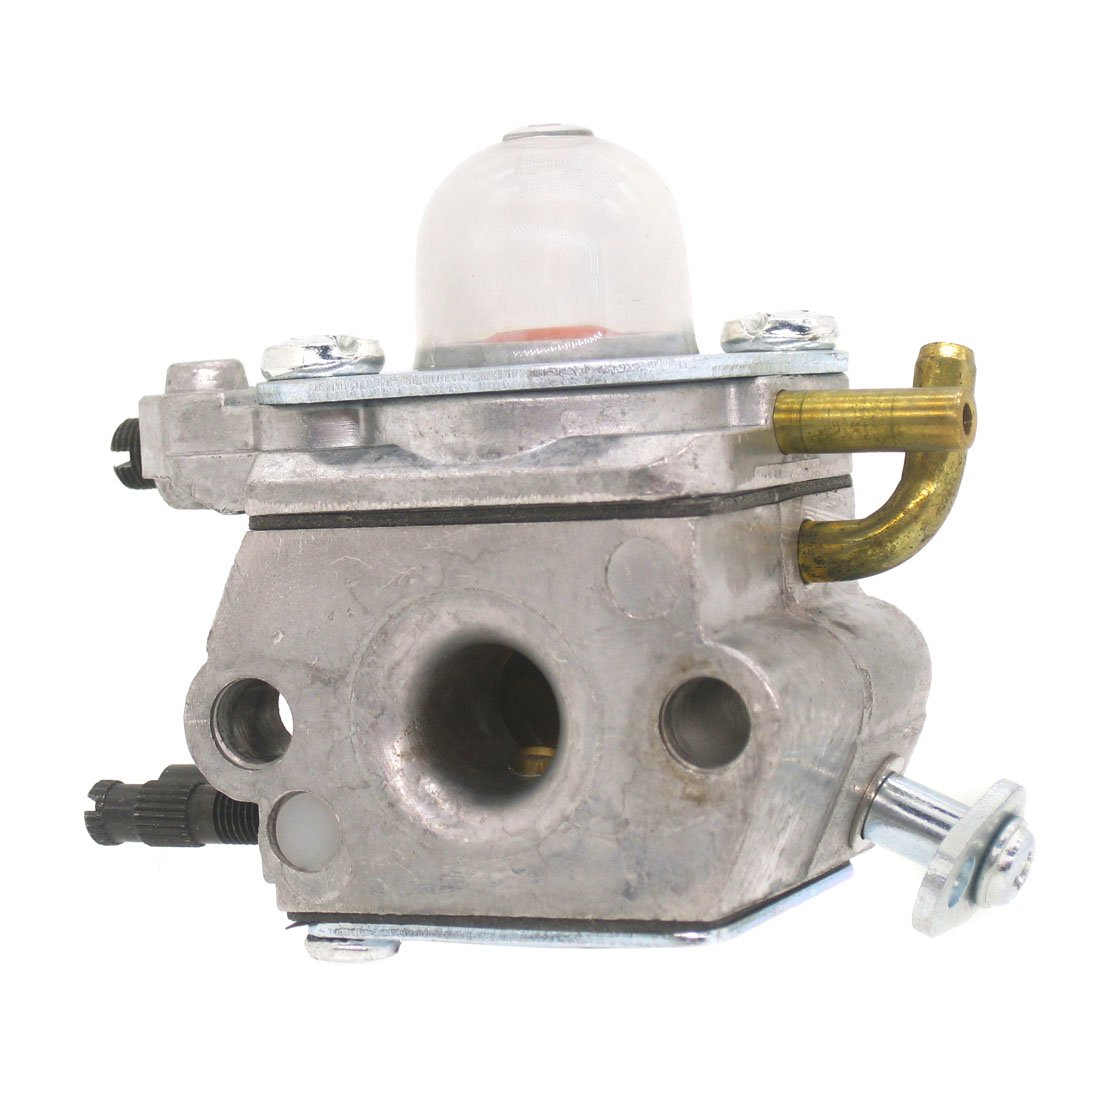 Atoparts Carburetor Carb for ZAMA C1U-K42B fits Echo PB-2100 PB2100 Handheld Power Blower